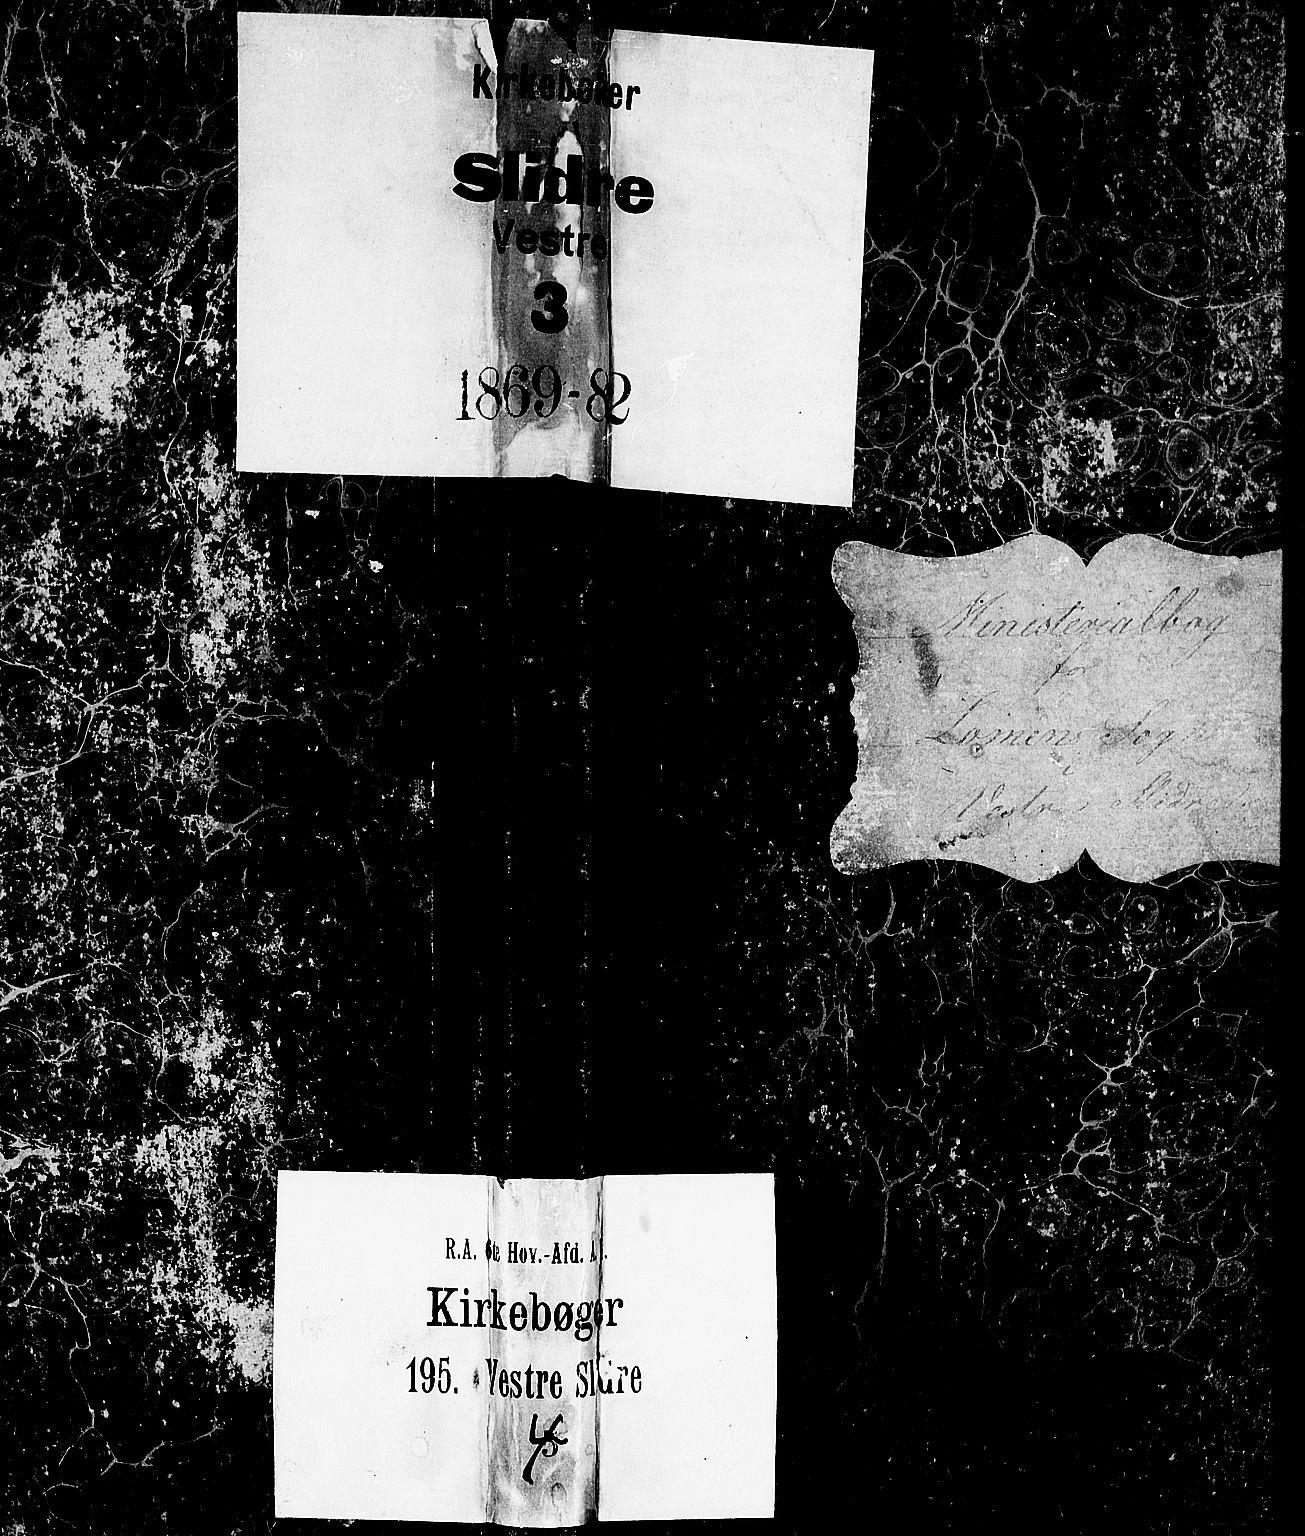 SAH, Vestre Slidre prestekontor, Klokkerbok nr. 2, 1869-1882